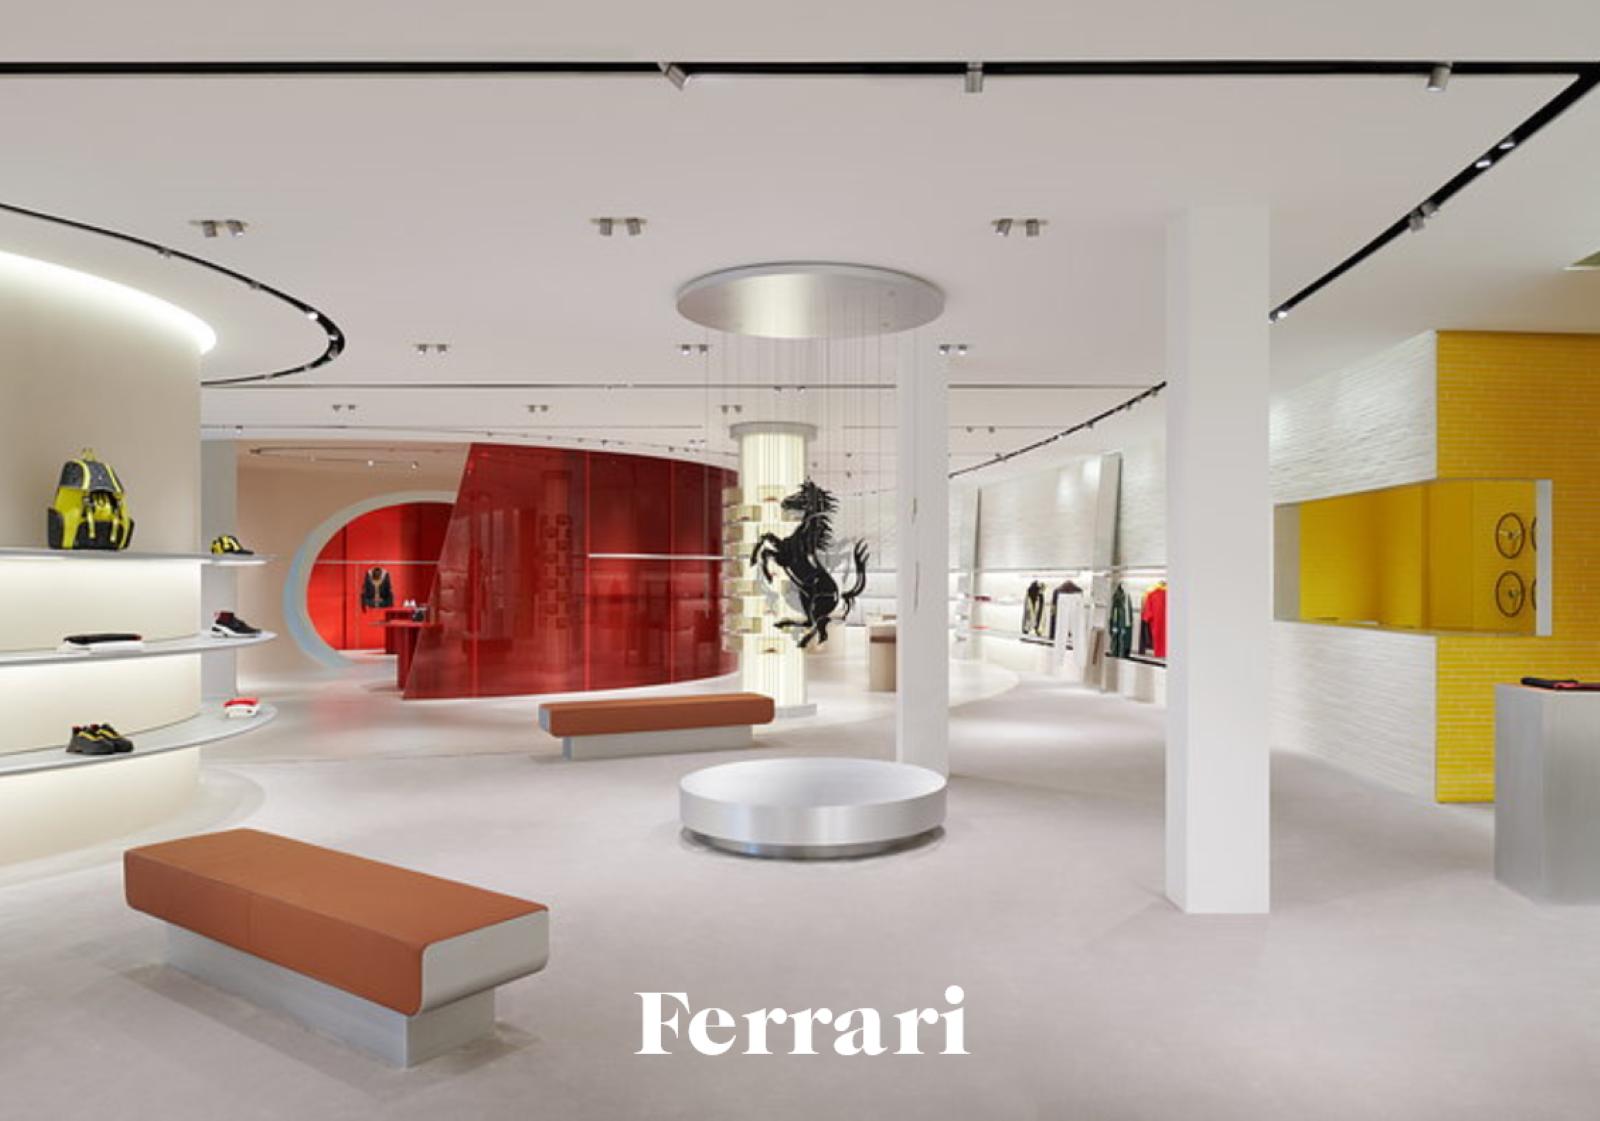 Ferrari innovation tour missions mmm 0